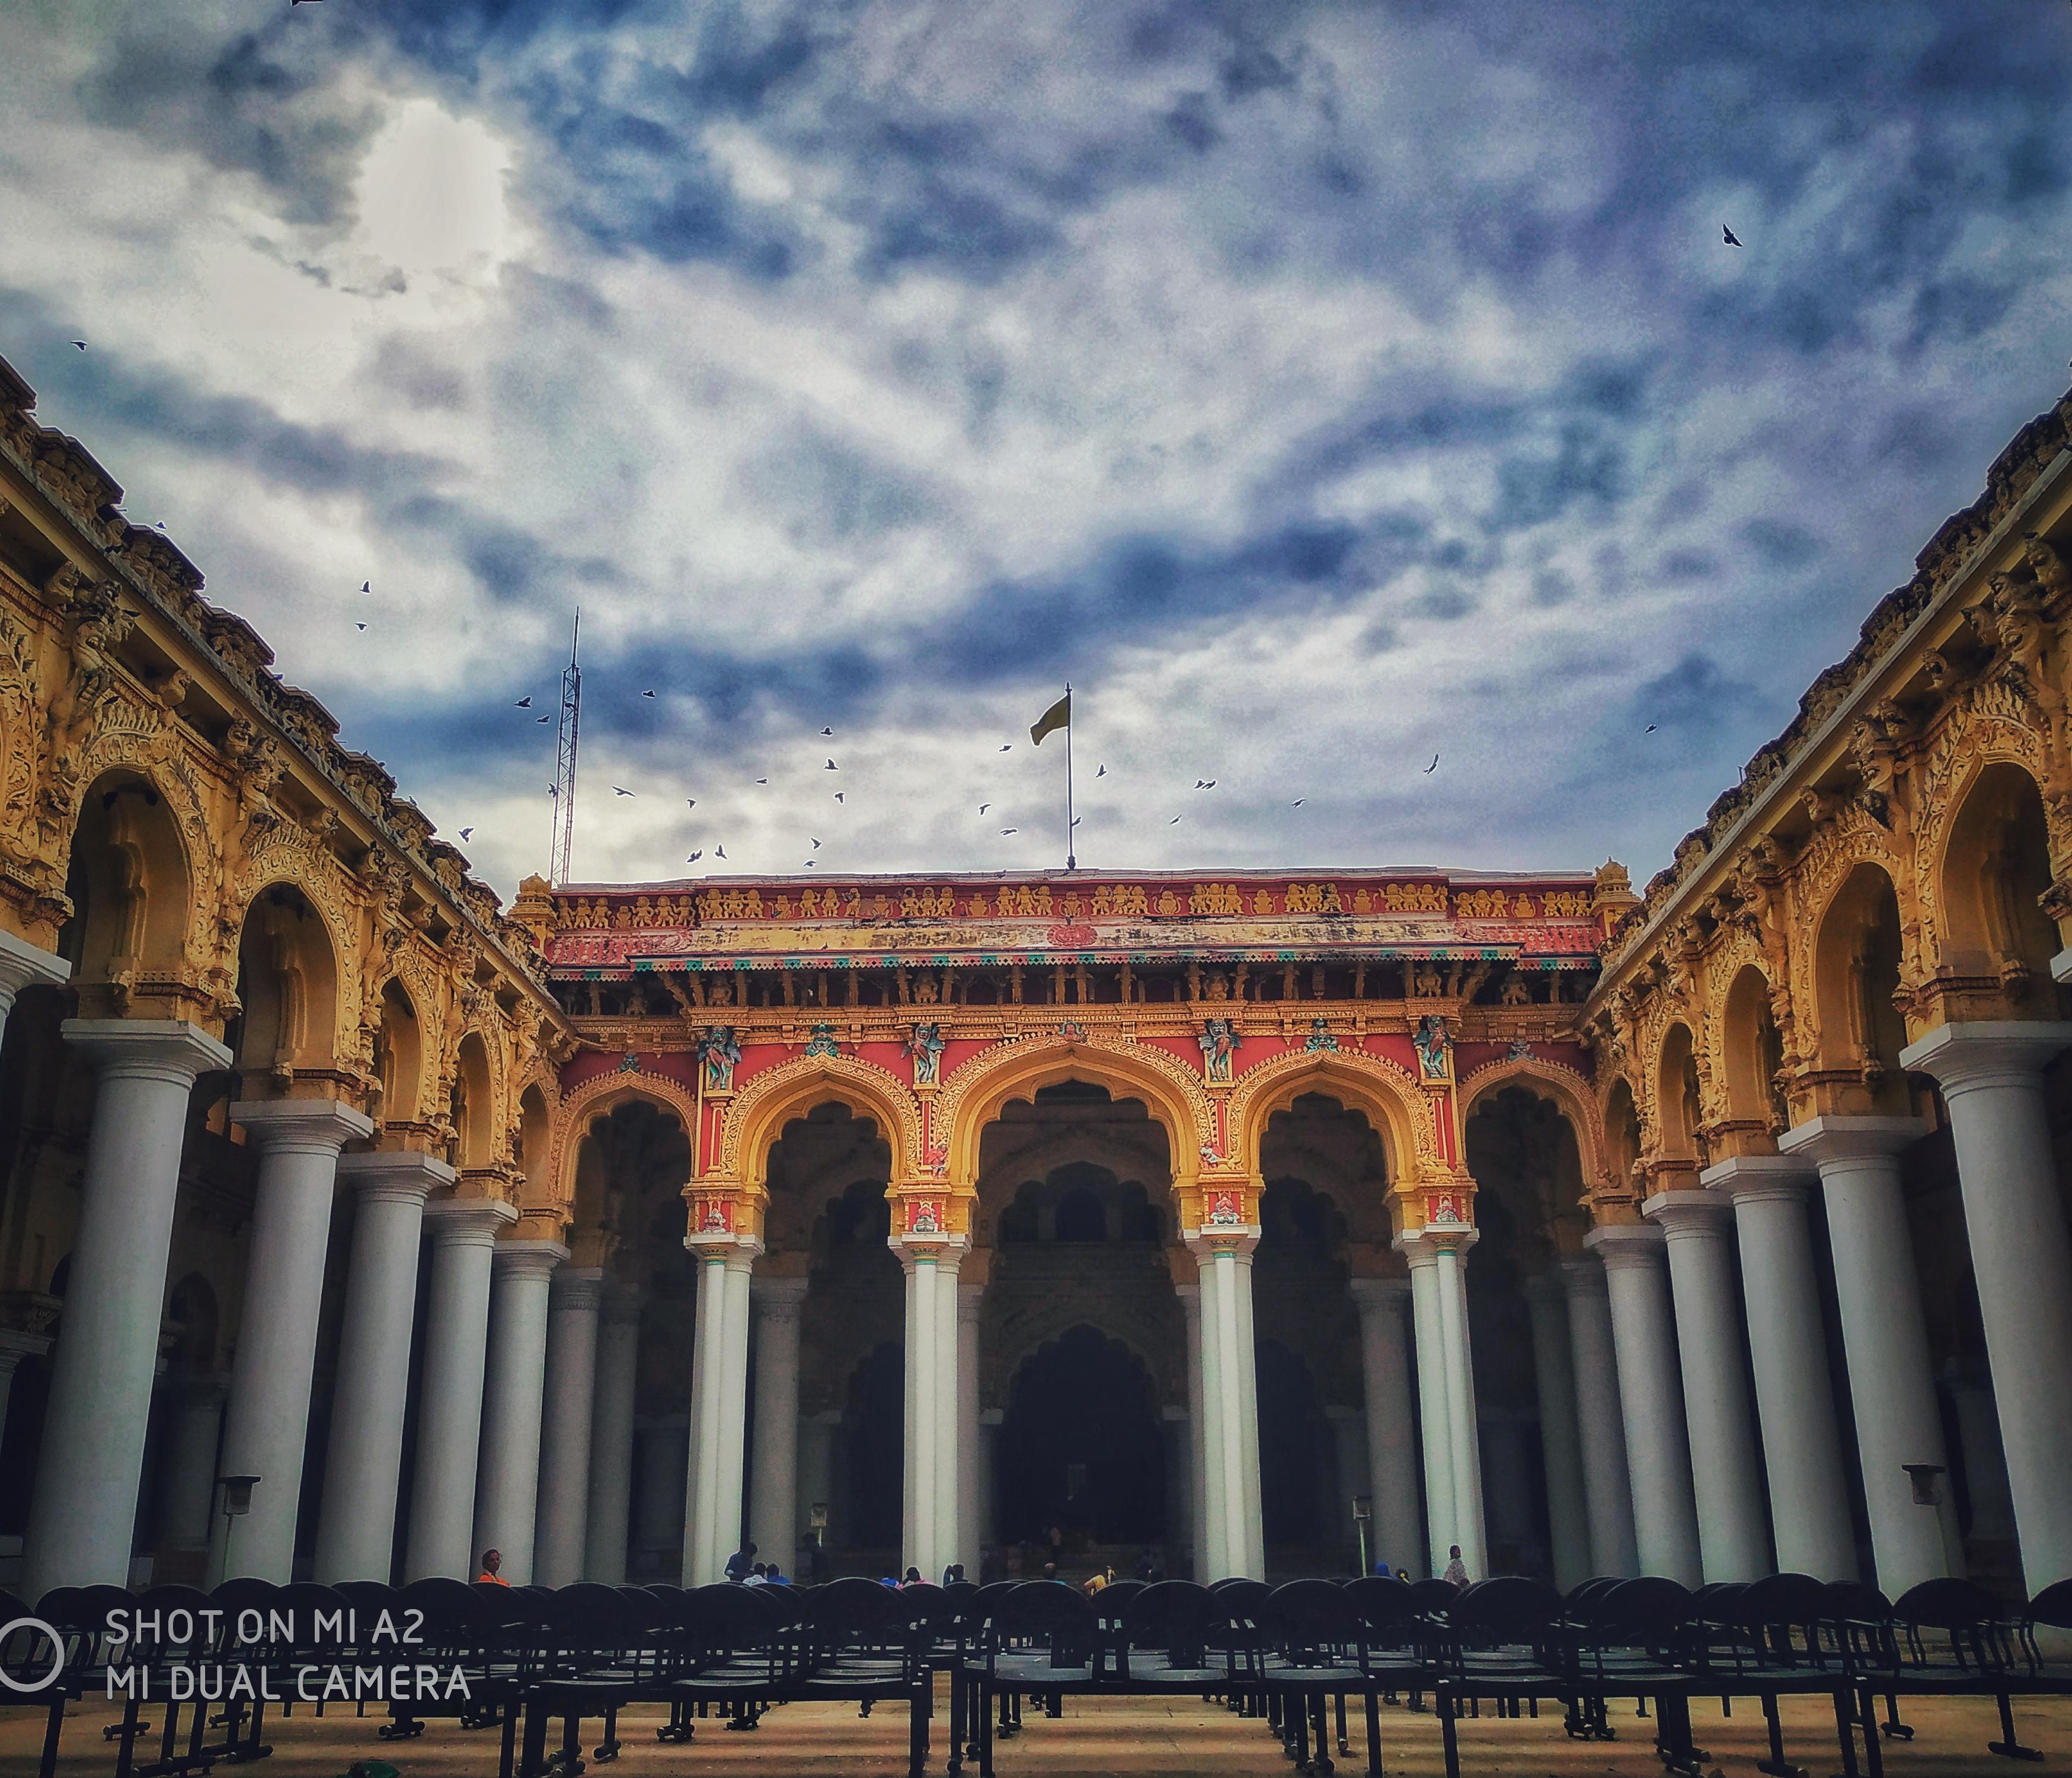 Thirumalai Nayakkar Mahal - Wikipedia